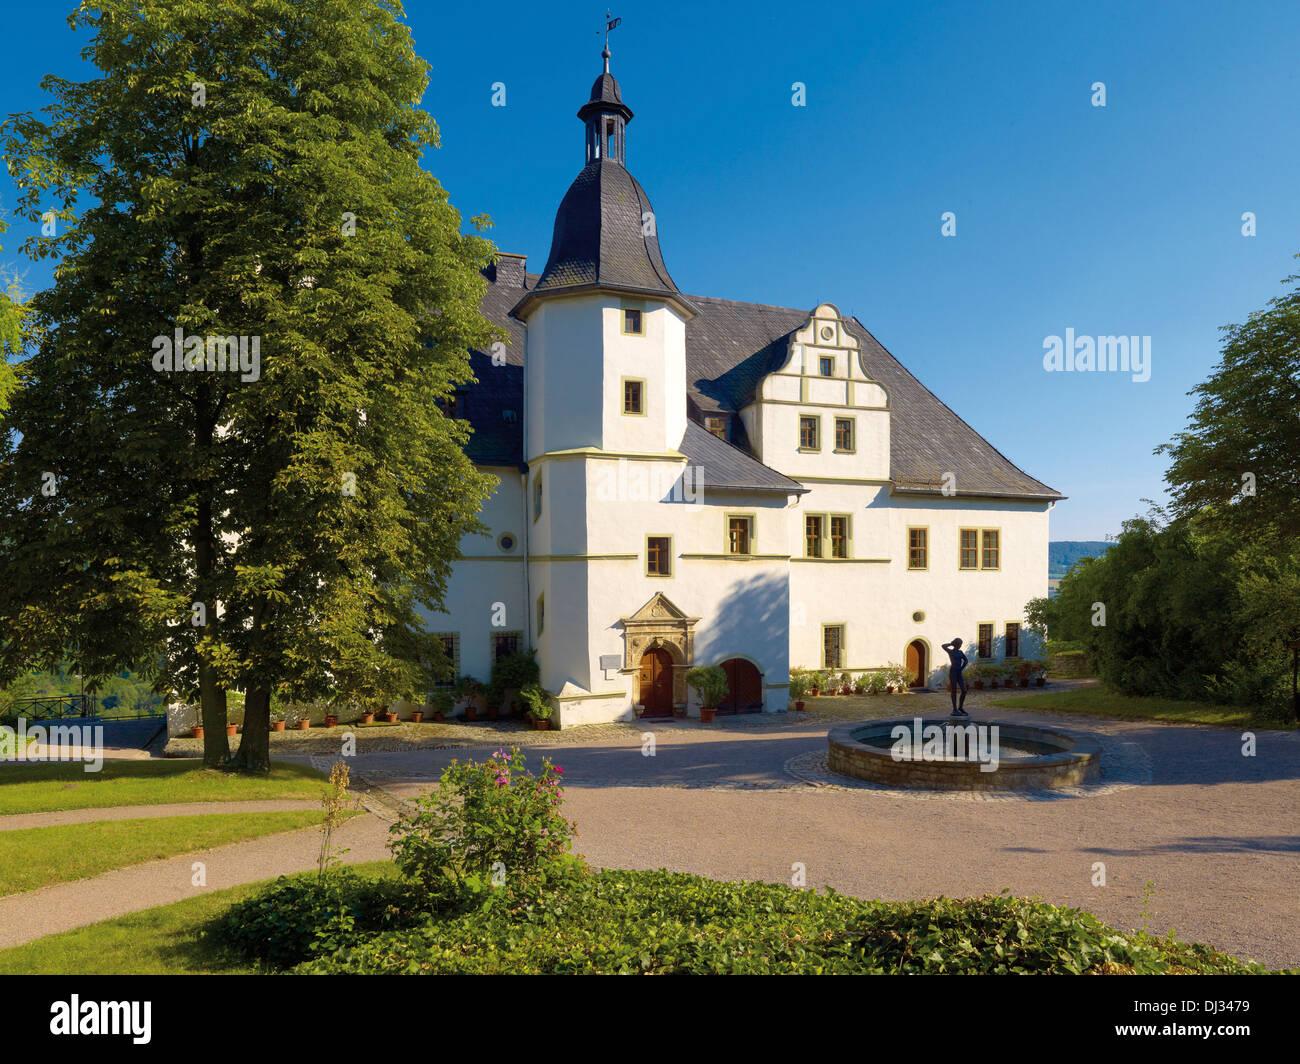 Renaissance castle, Dornburg castles, Dornburg, Thuringia, Germany - Stock Image